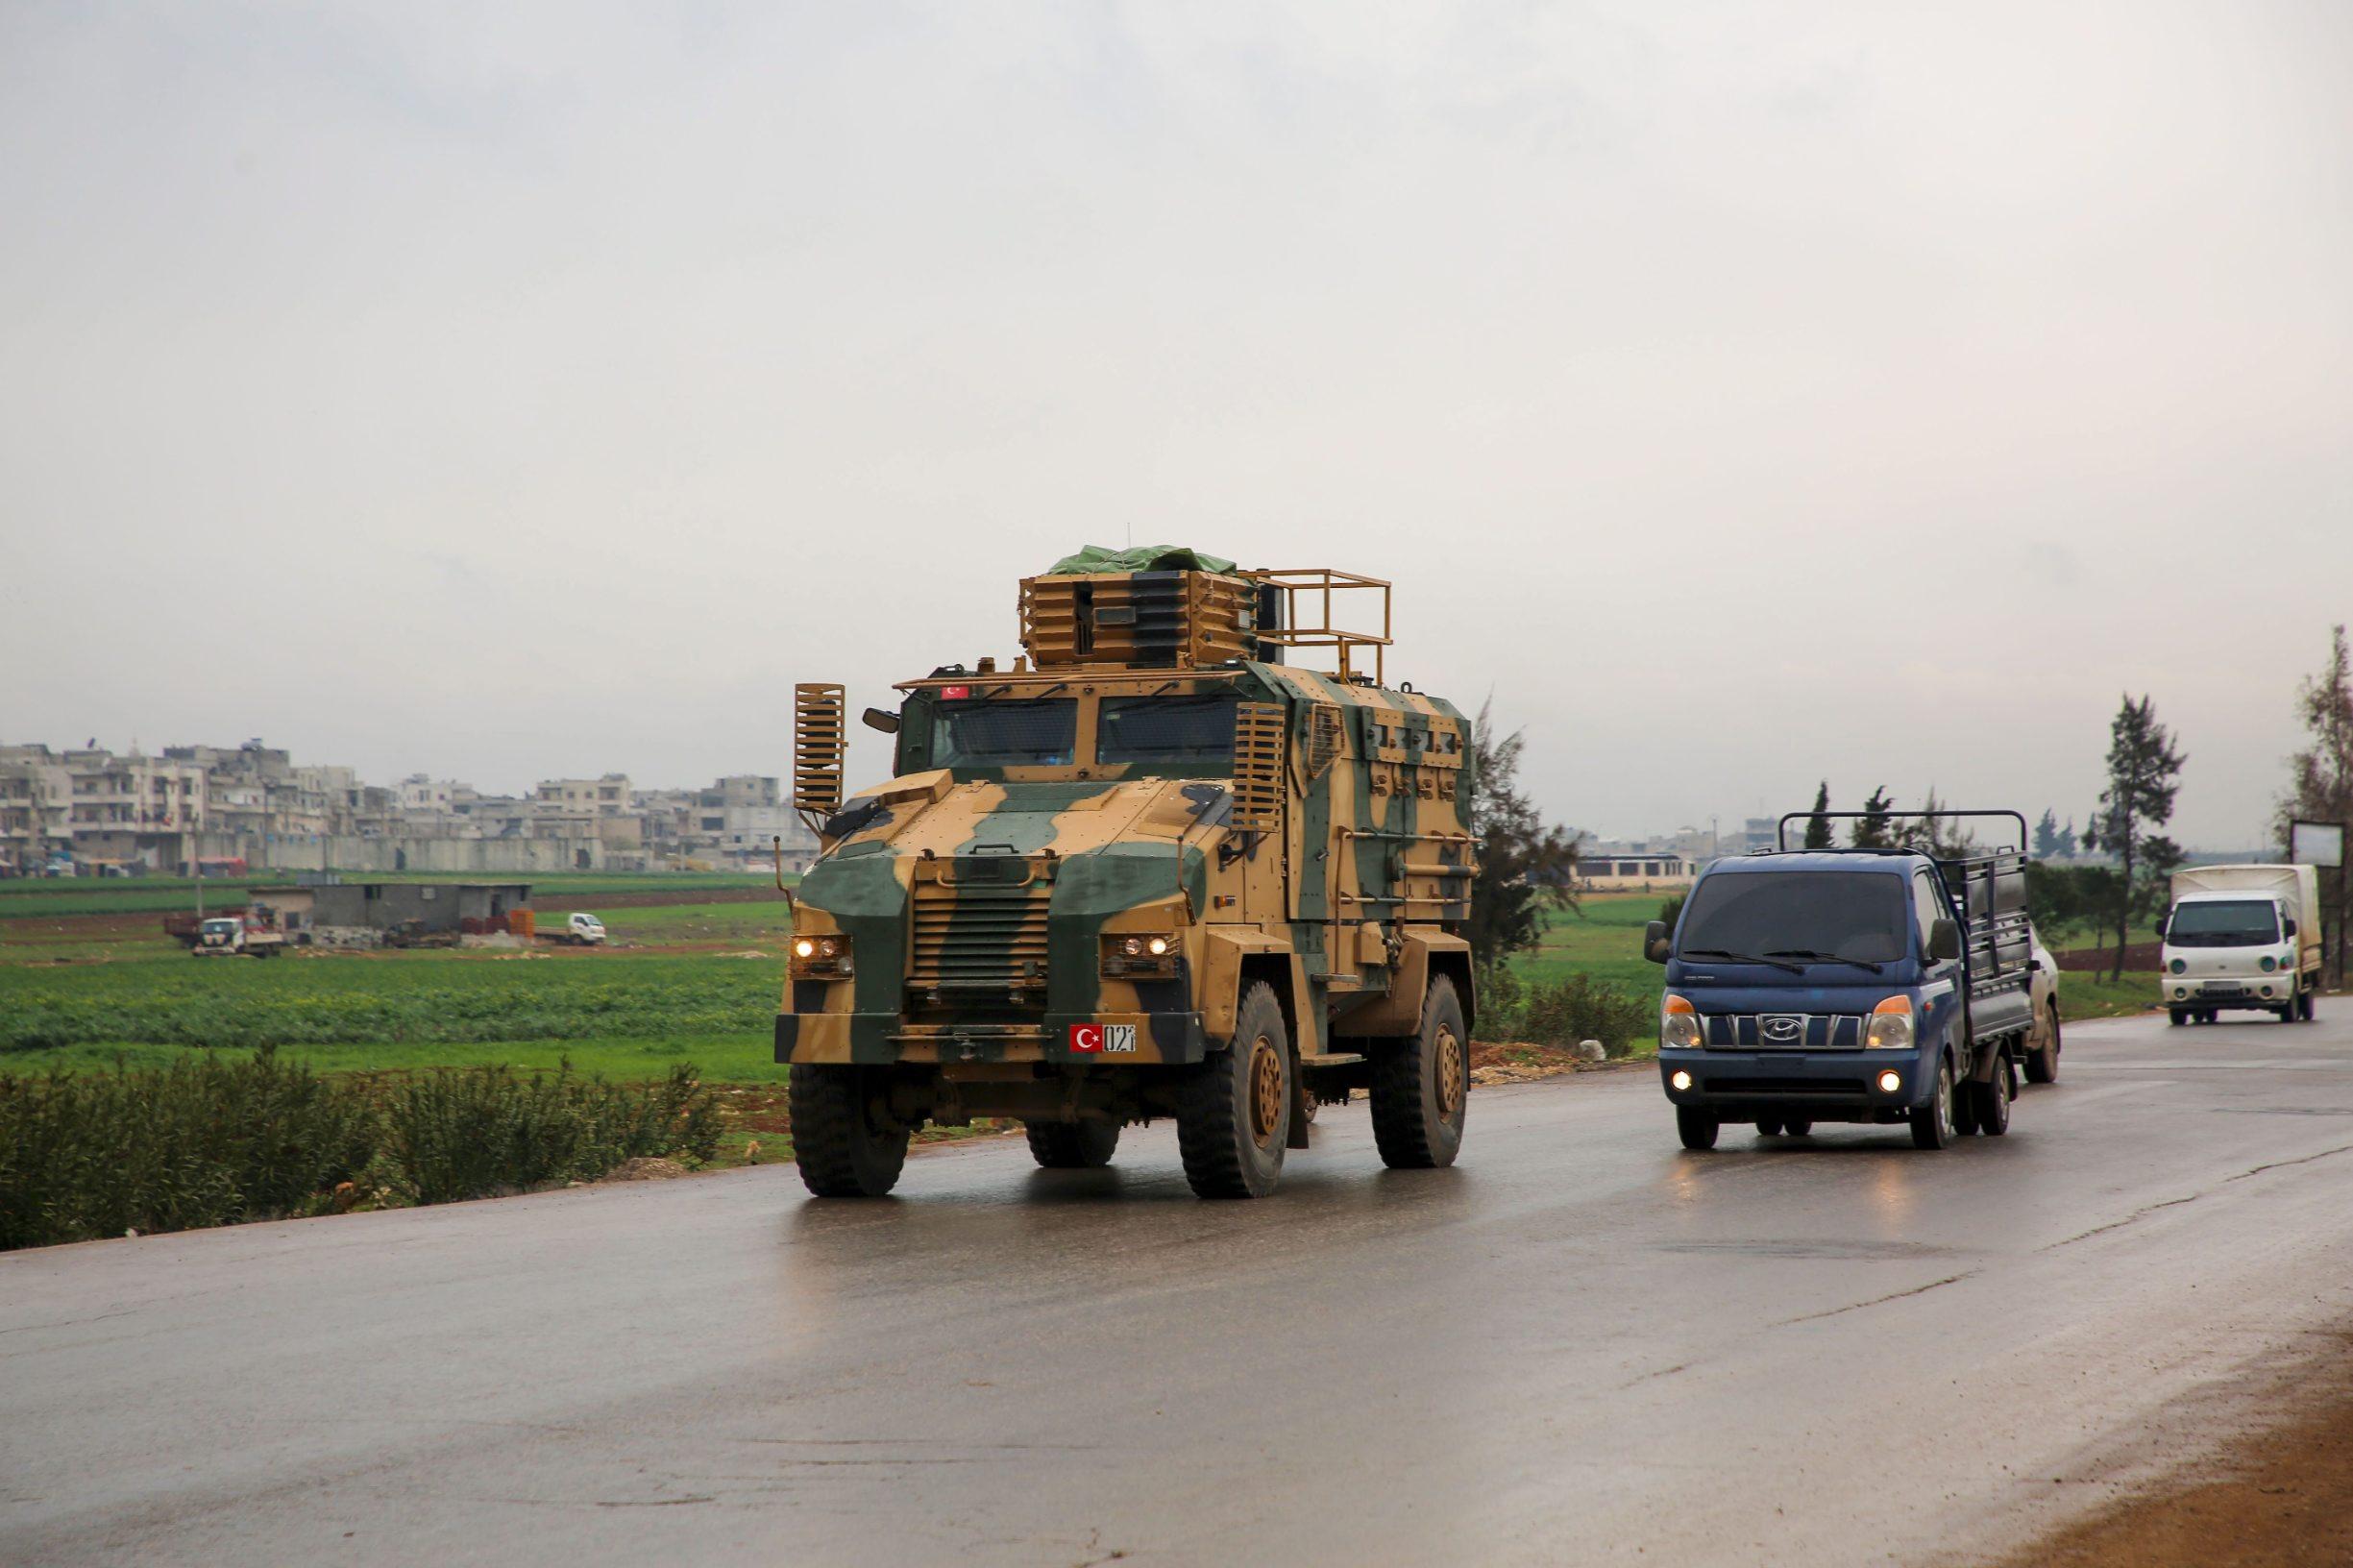 AFP_1QA6ZM